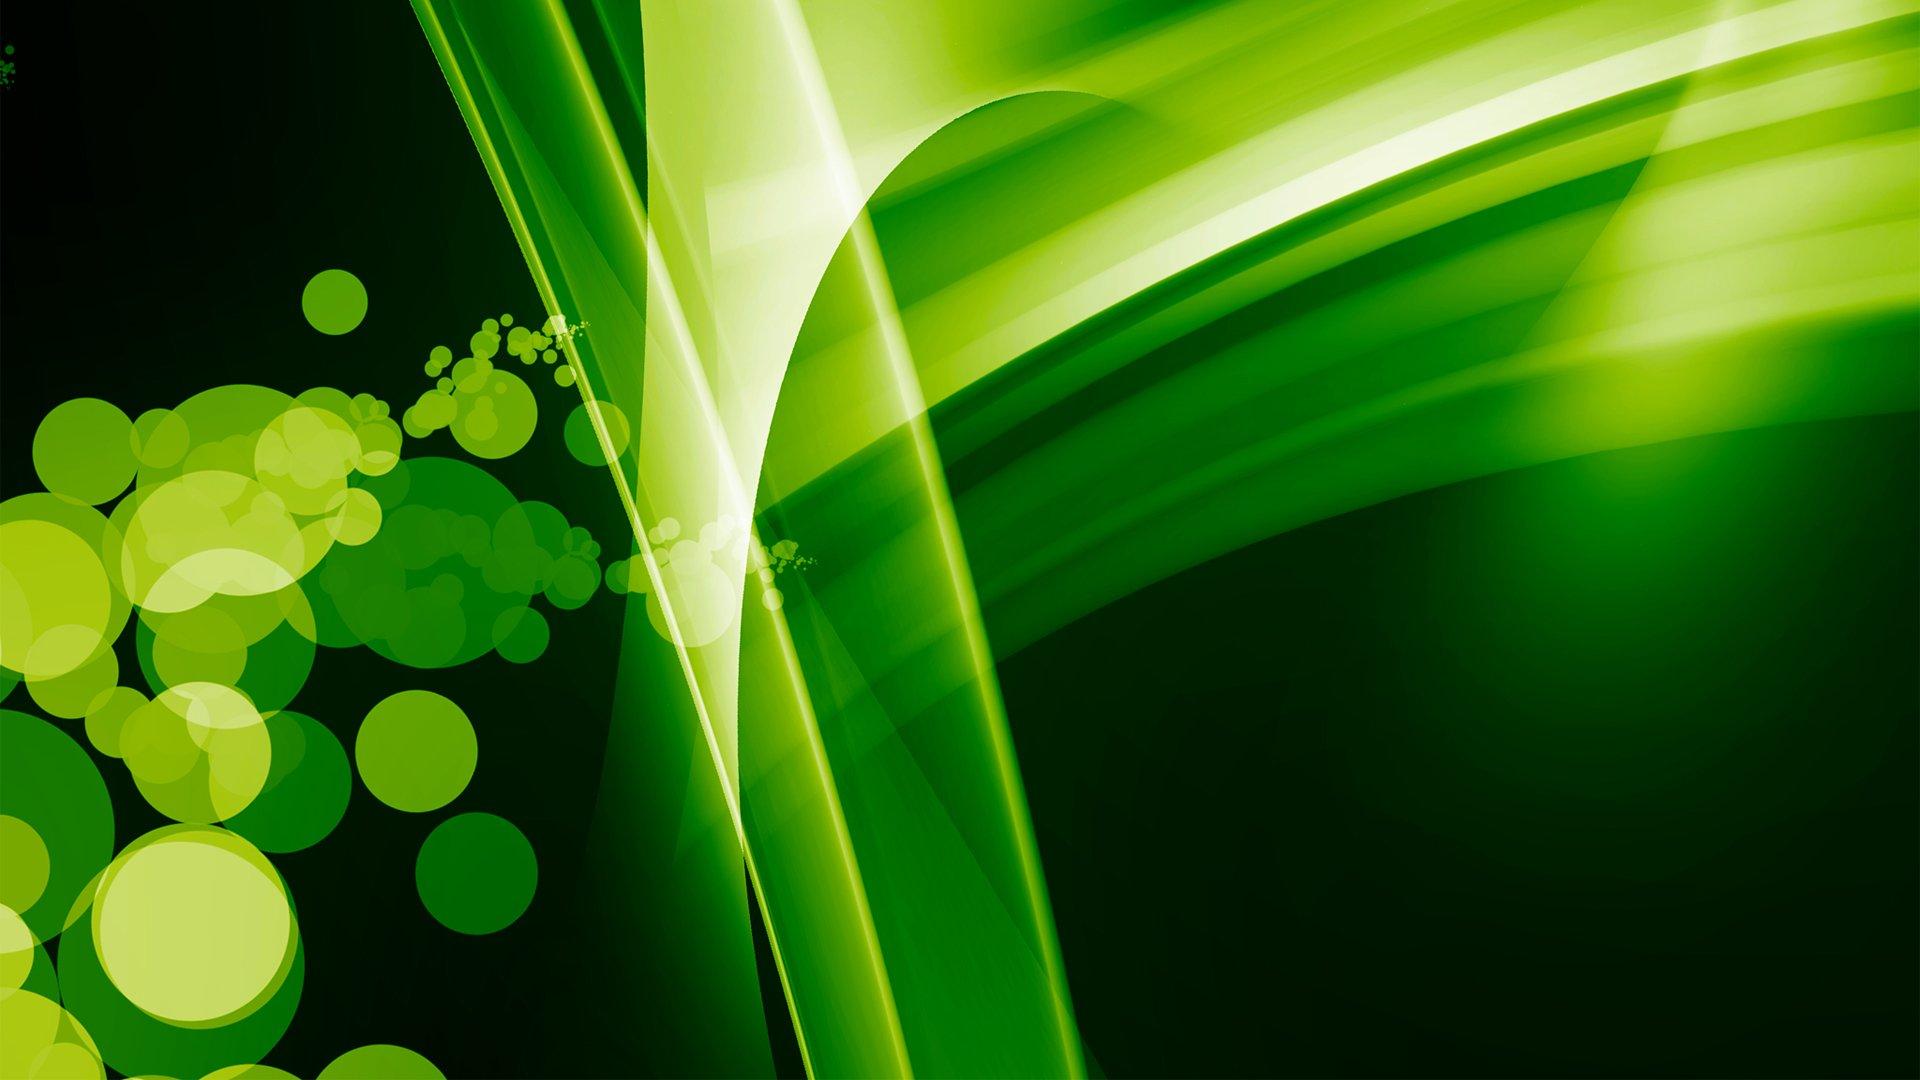 зеленая абстракция картинки смартфон крыло птицы ролла